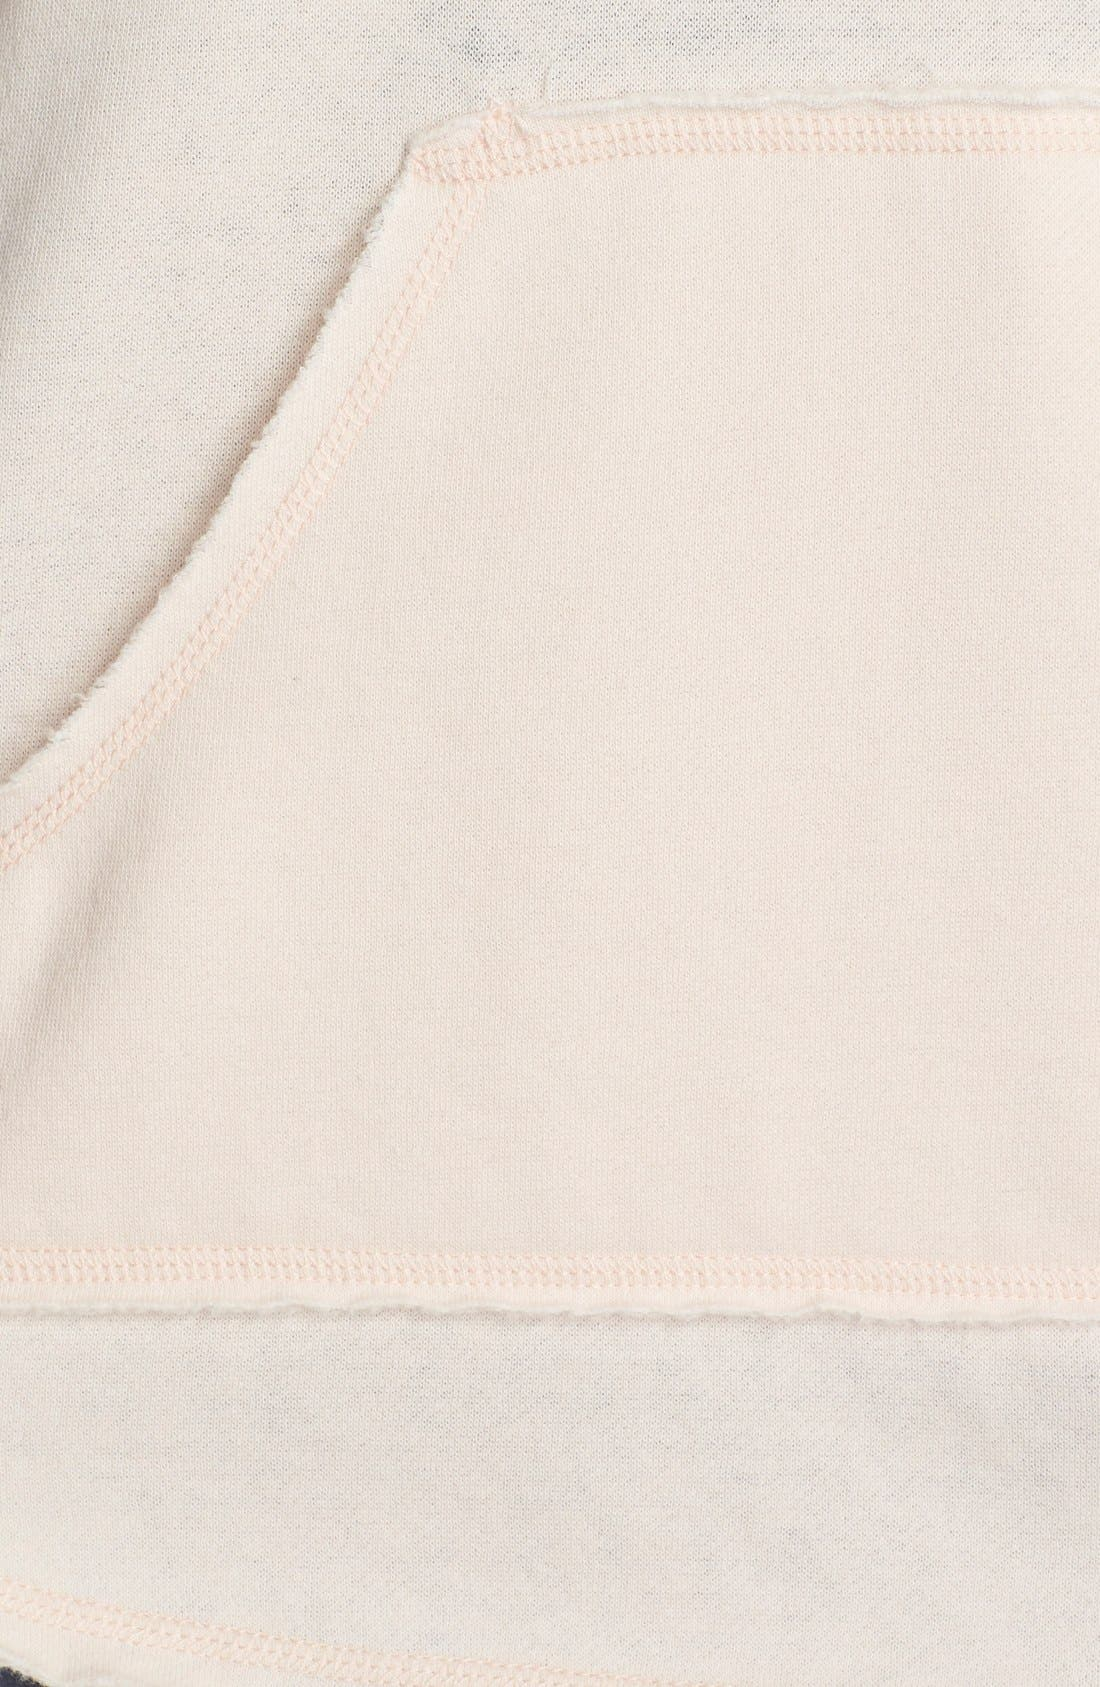 'Love Ya, Mean It' Hooded Sweatshirt,                             Alternate thumbnail 6, color,